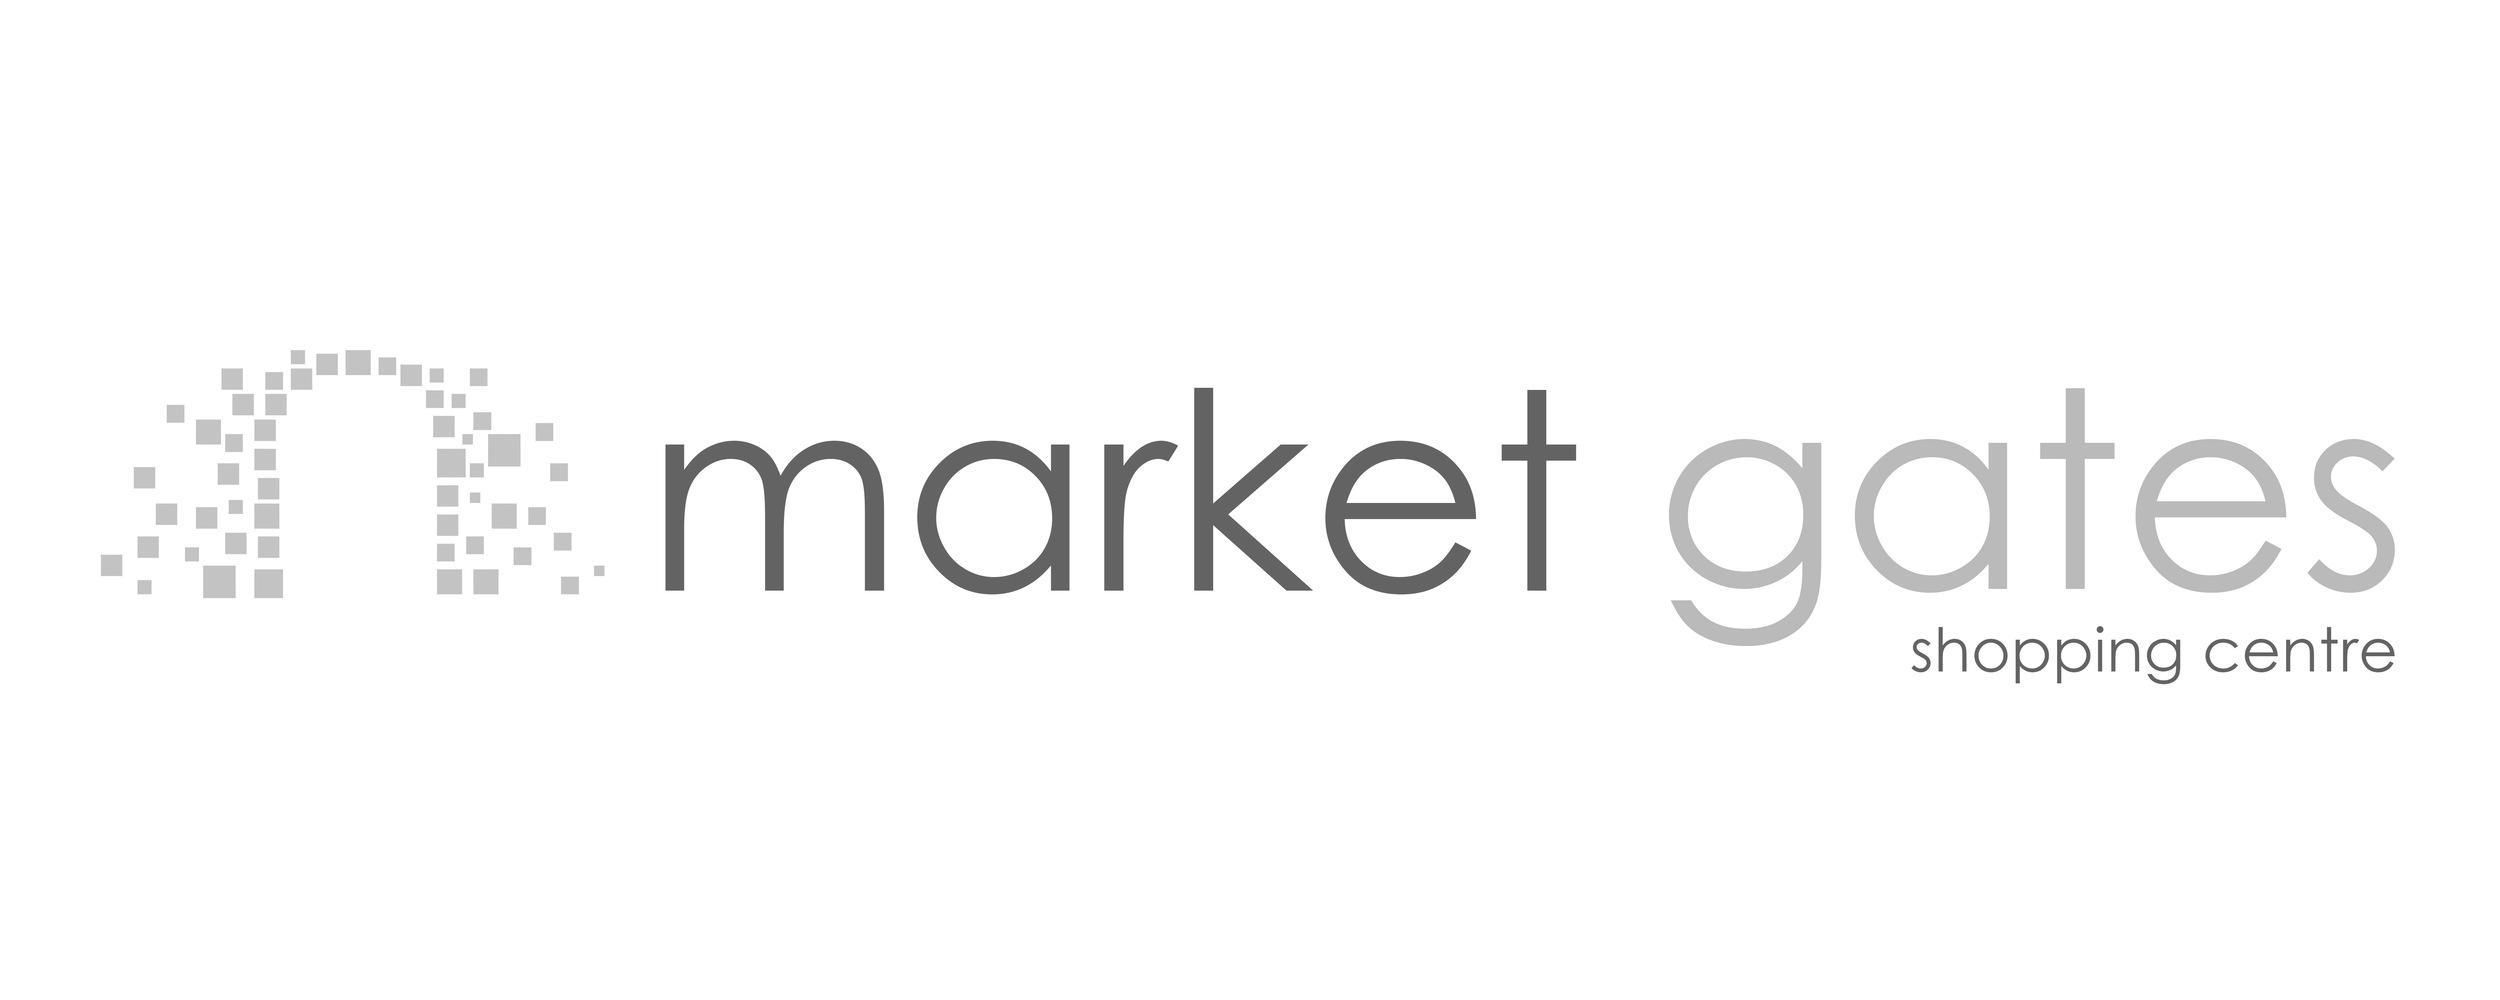 6 Great Yarmouth Market Gates.jpg